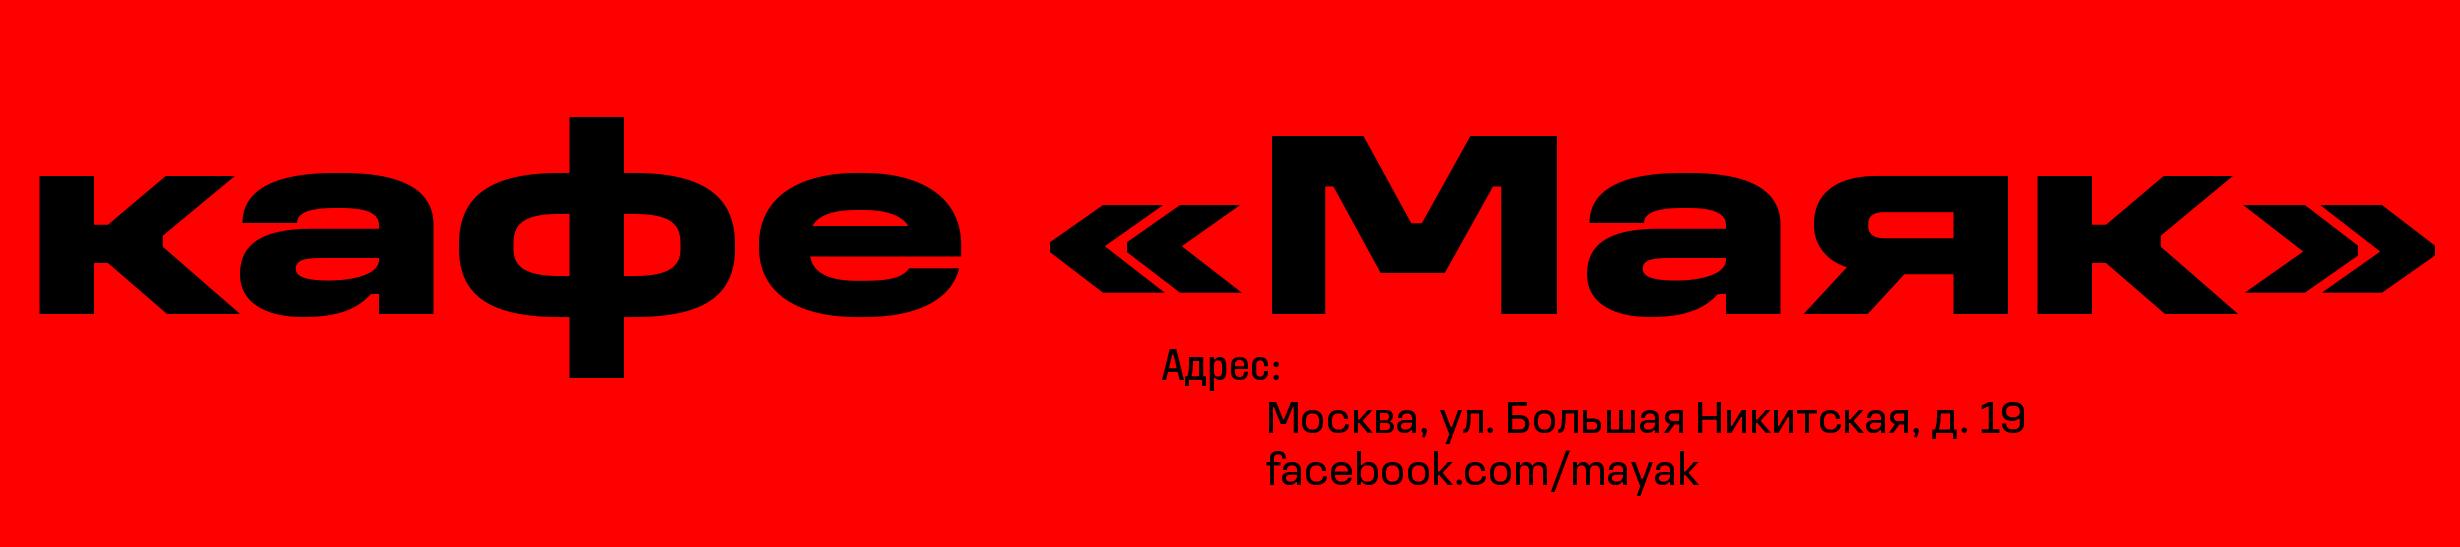 CSTM_Loos_Posts_13